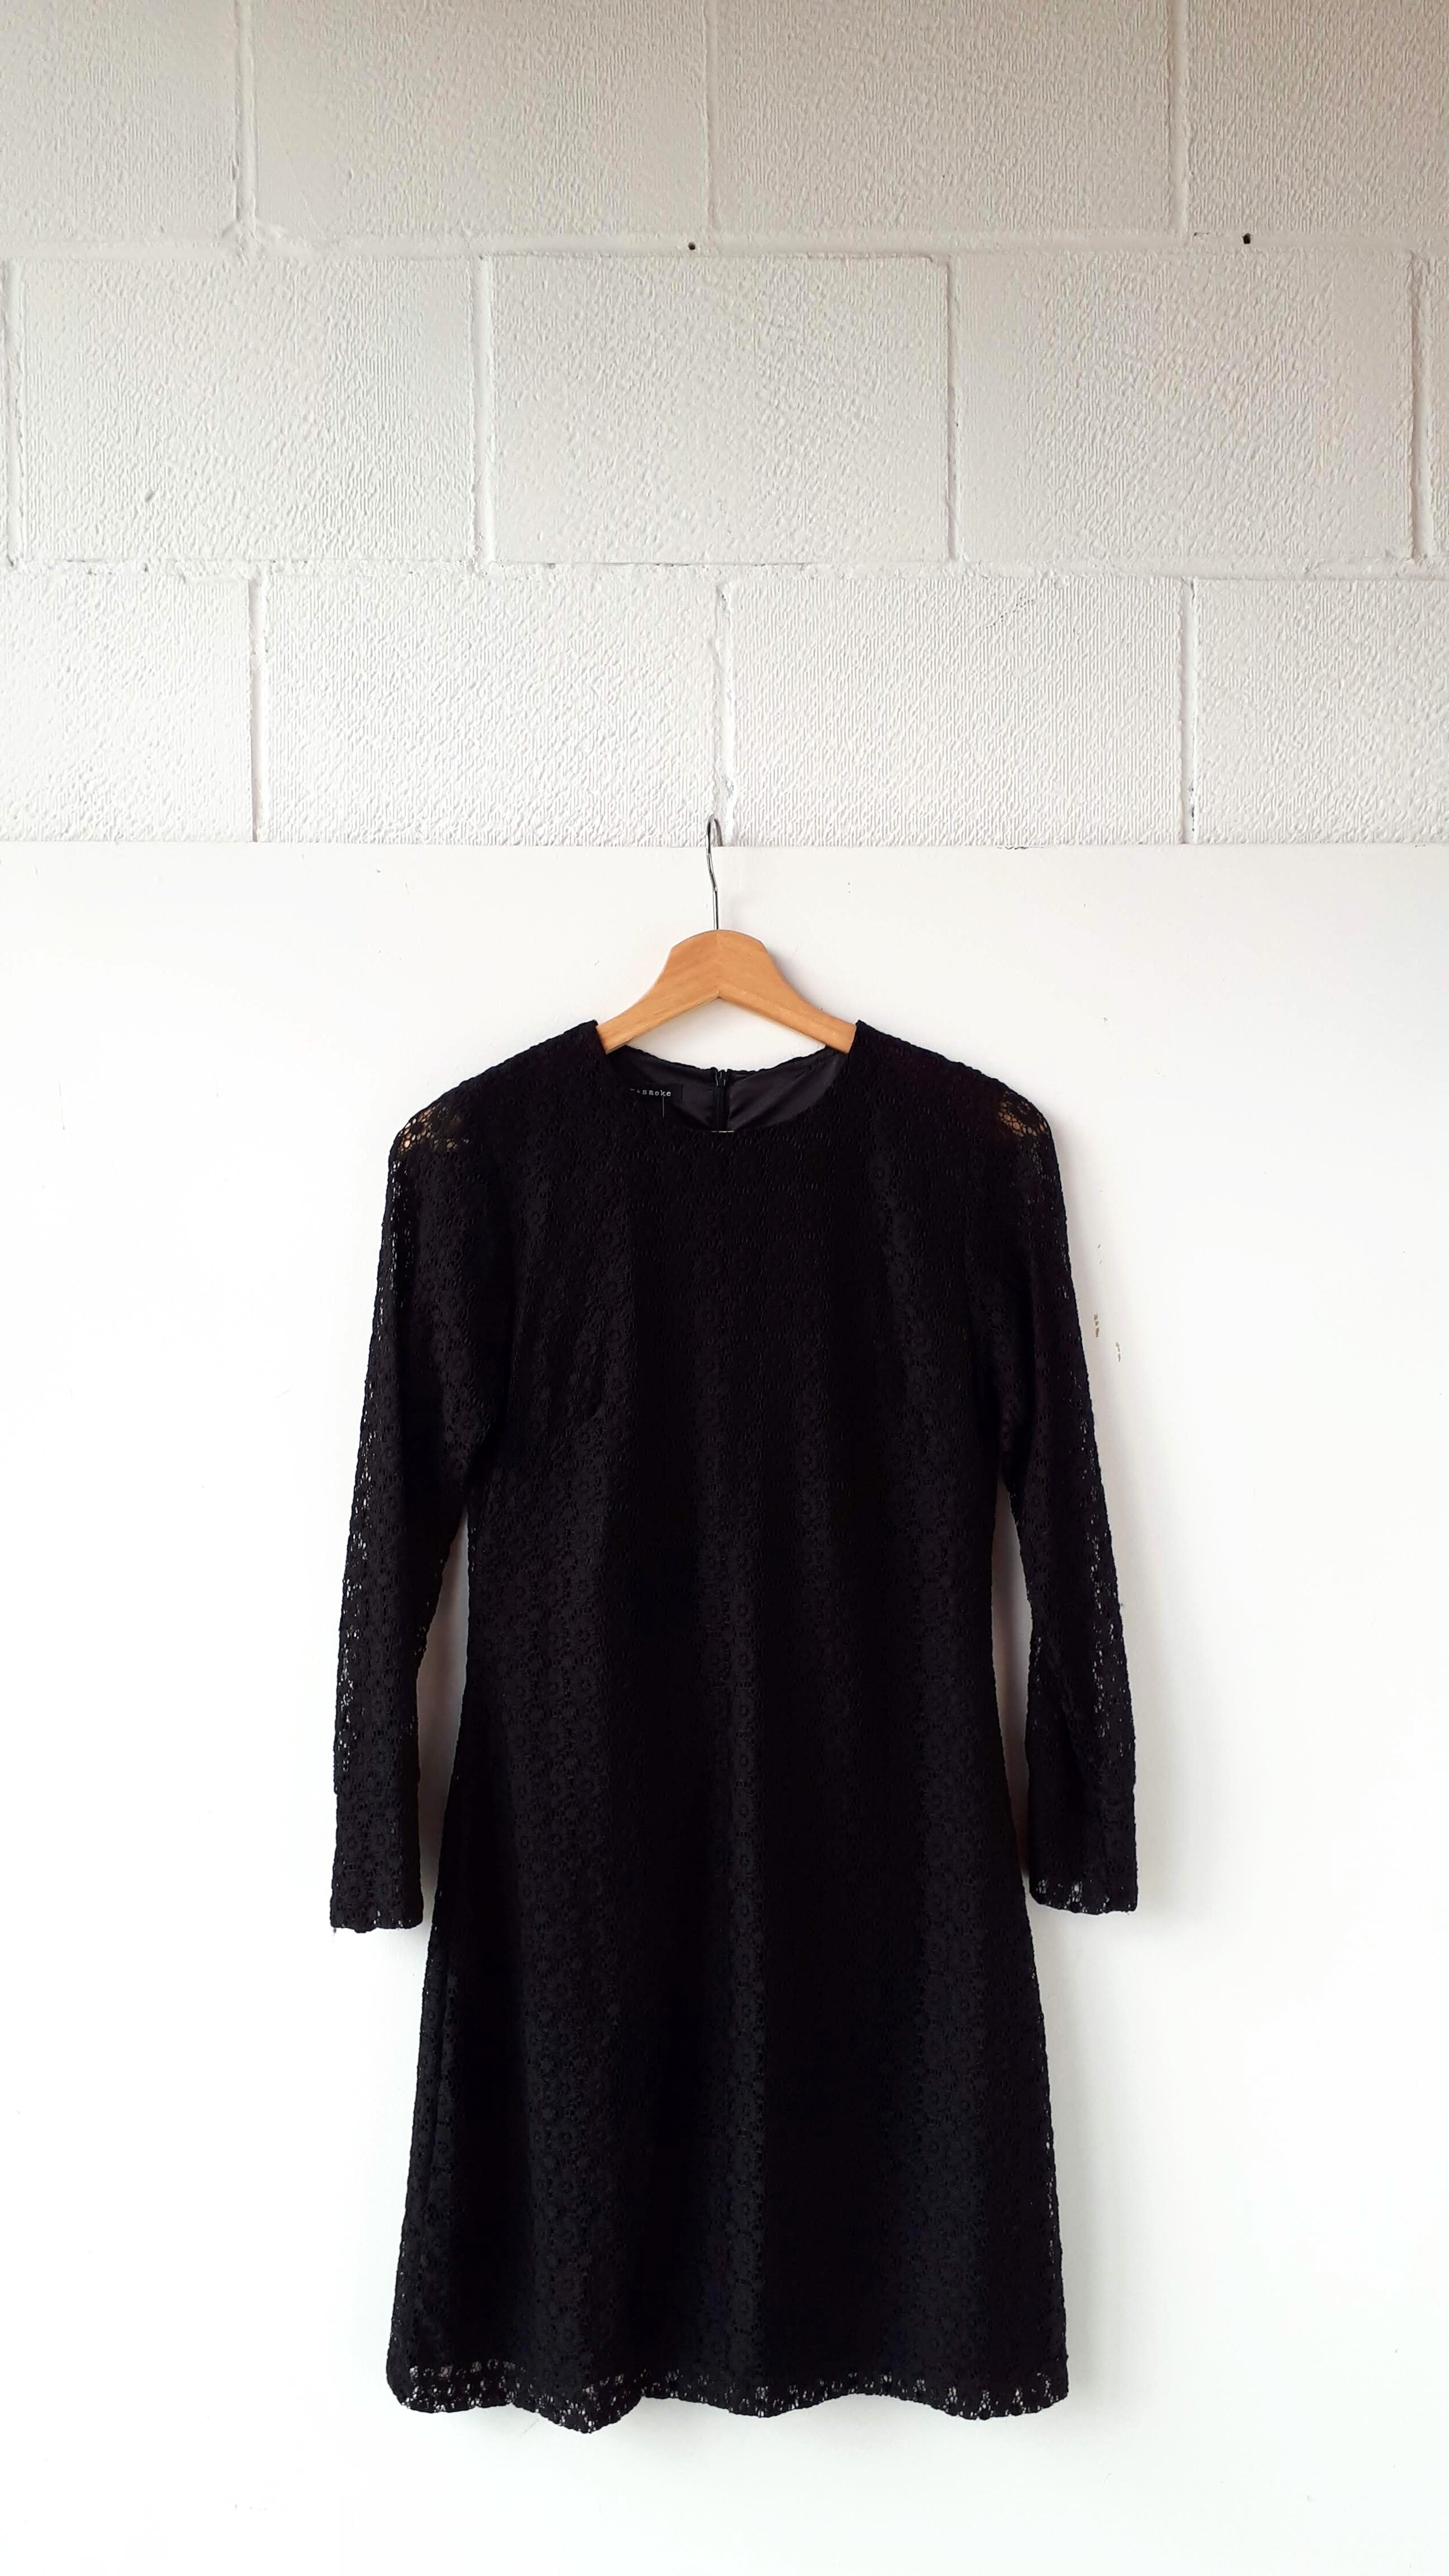 Cinder + Smoke dress; Size 4, $42